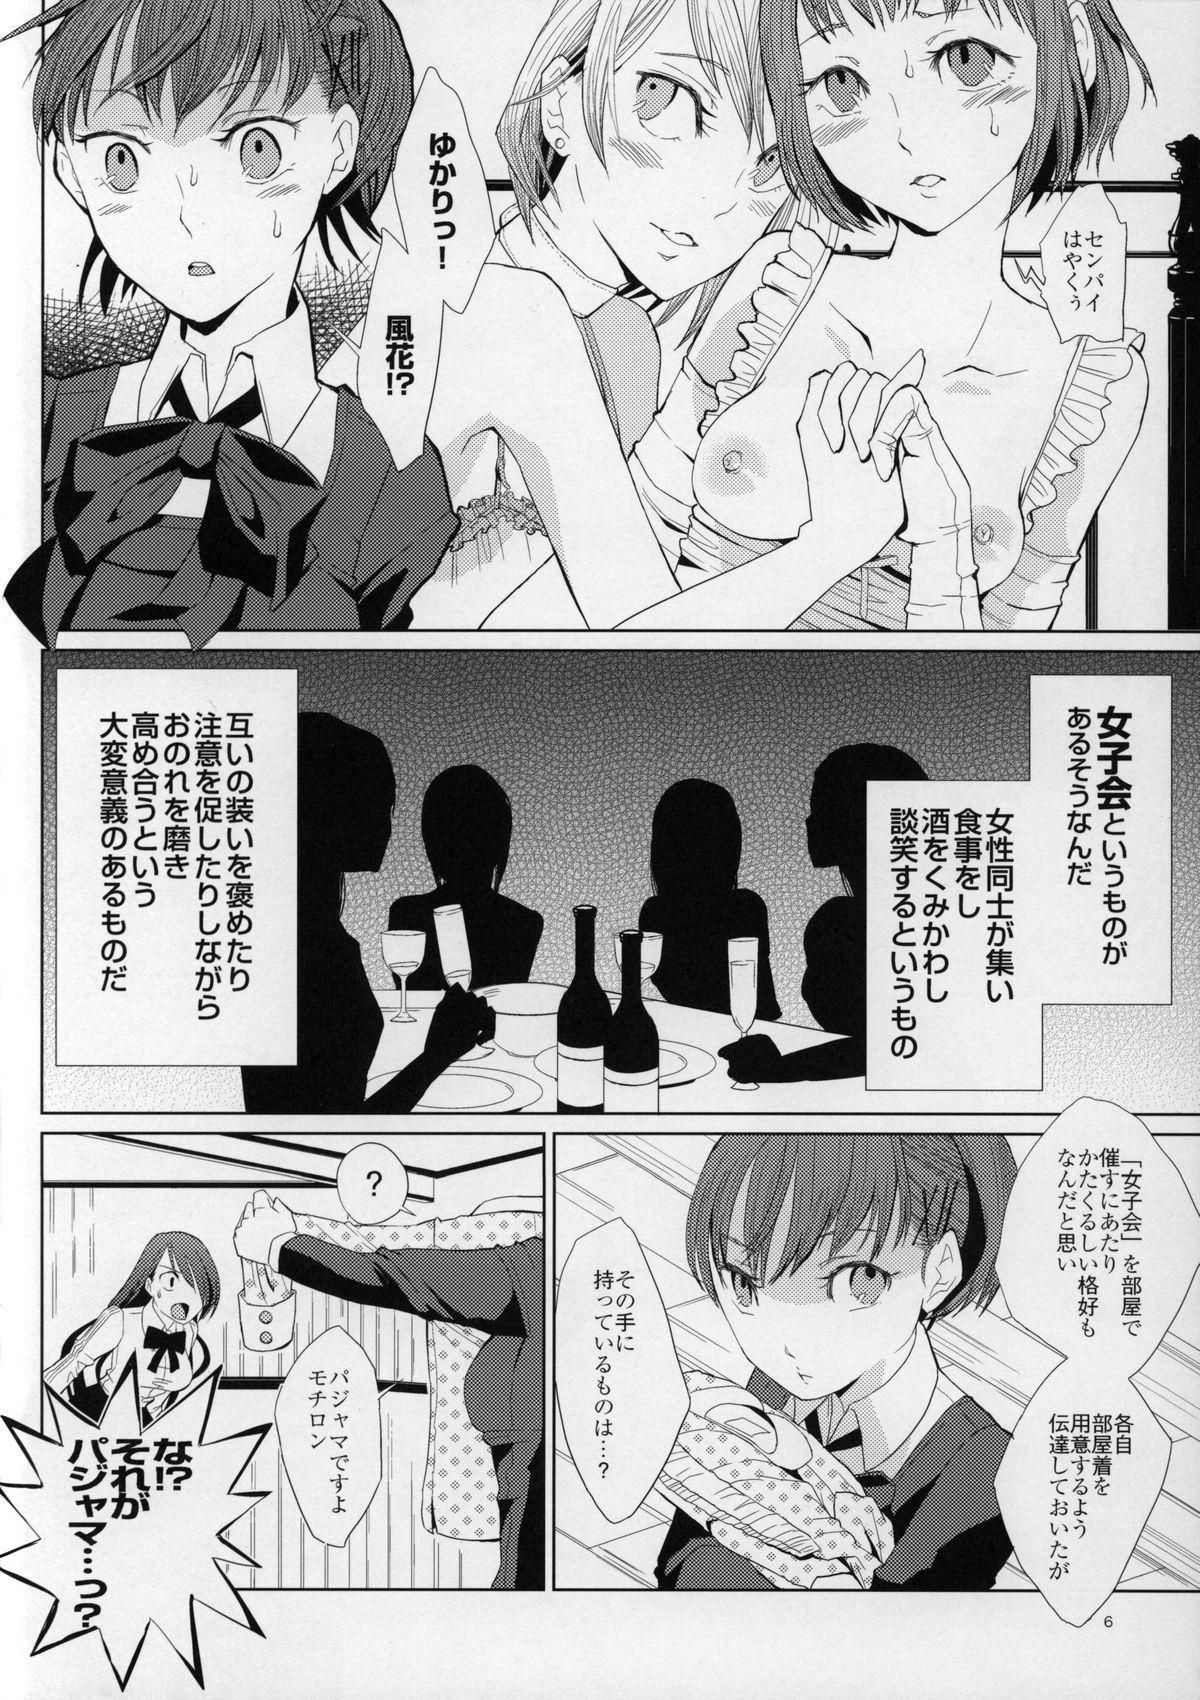 YURI SONA 2 Yoru no Joou - Midnight Queen 4